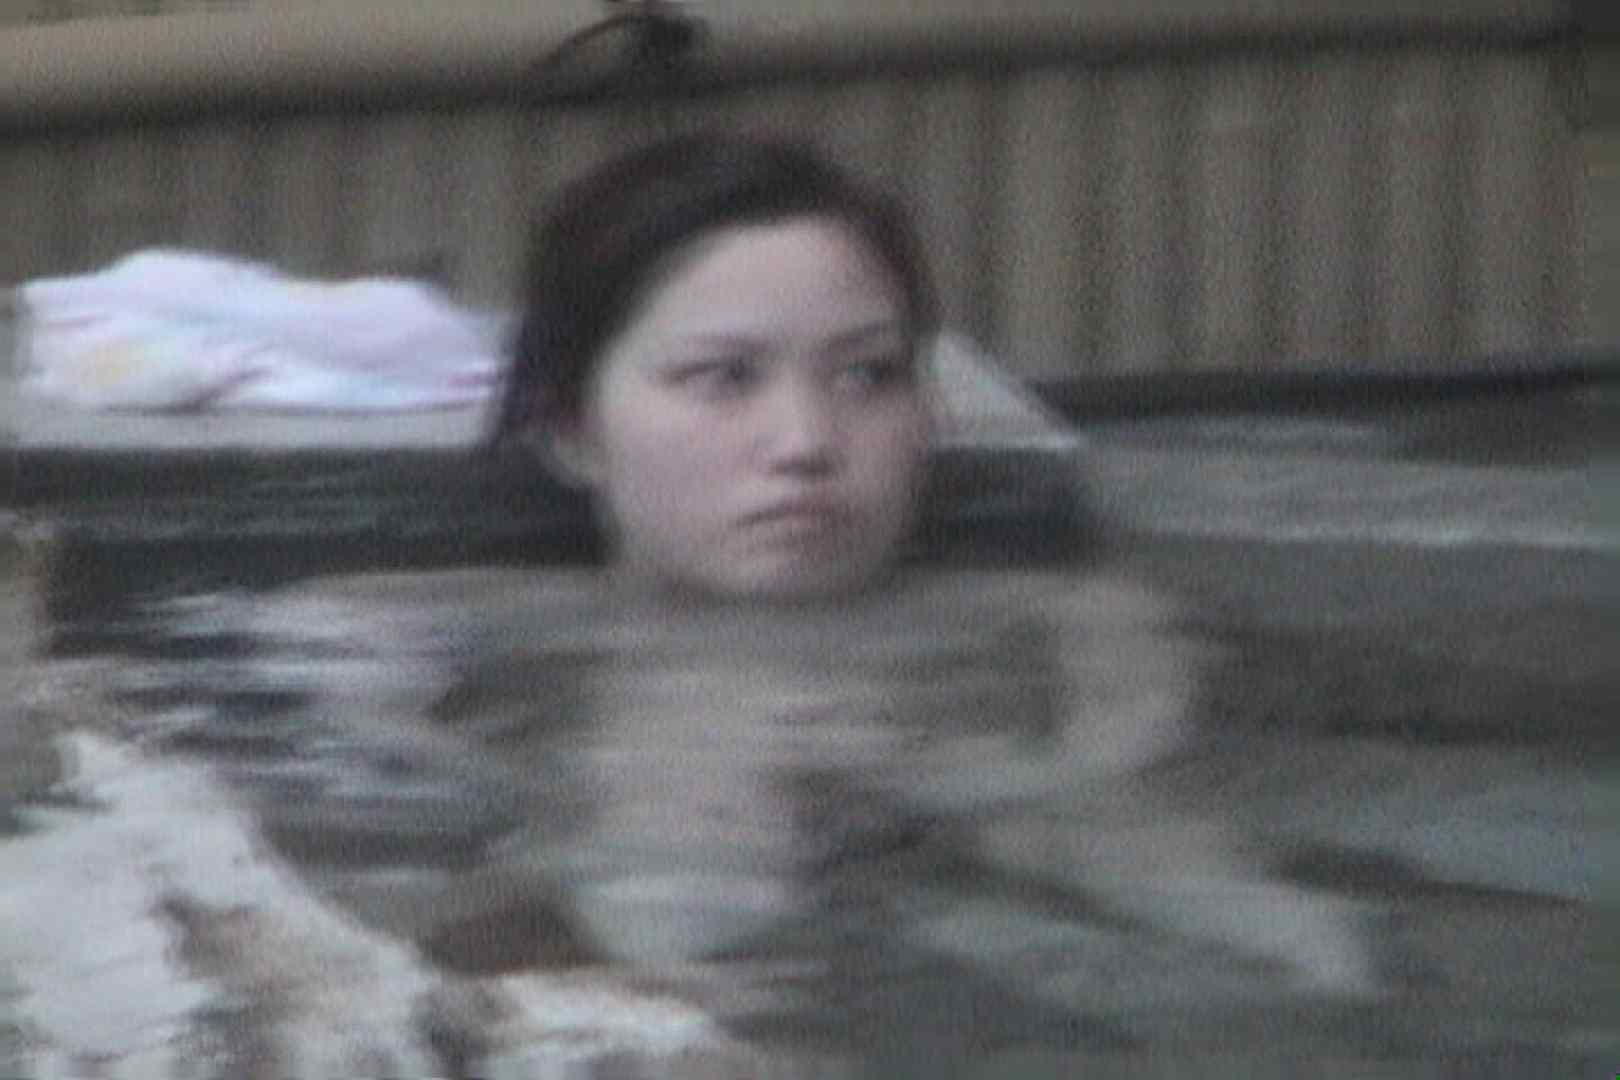 Aquaな露天風呂Vol.602 露天風呂突入 性交動画流出 98pic 86